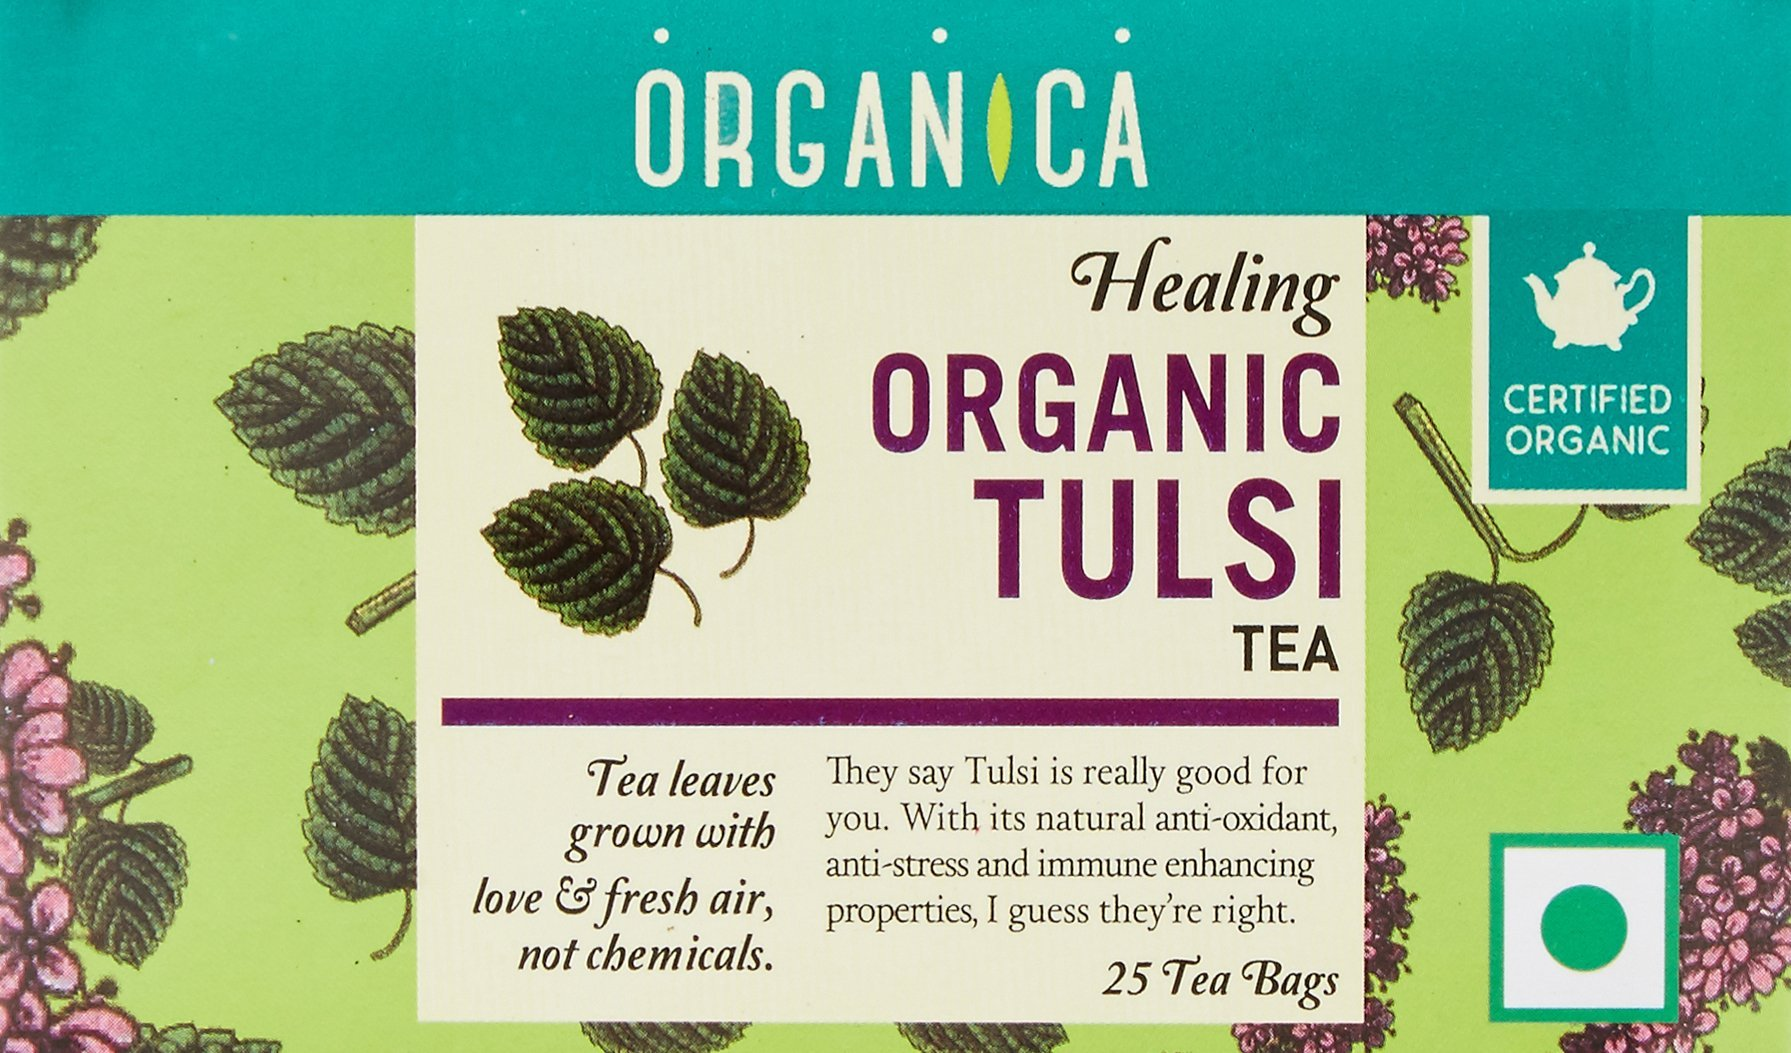 Organica USDA Certified Organic Tulsi Tea 2.5 oz (70 g) - 25 Tea Bags